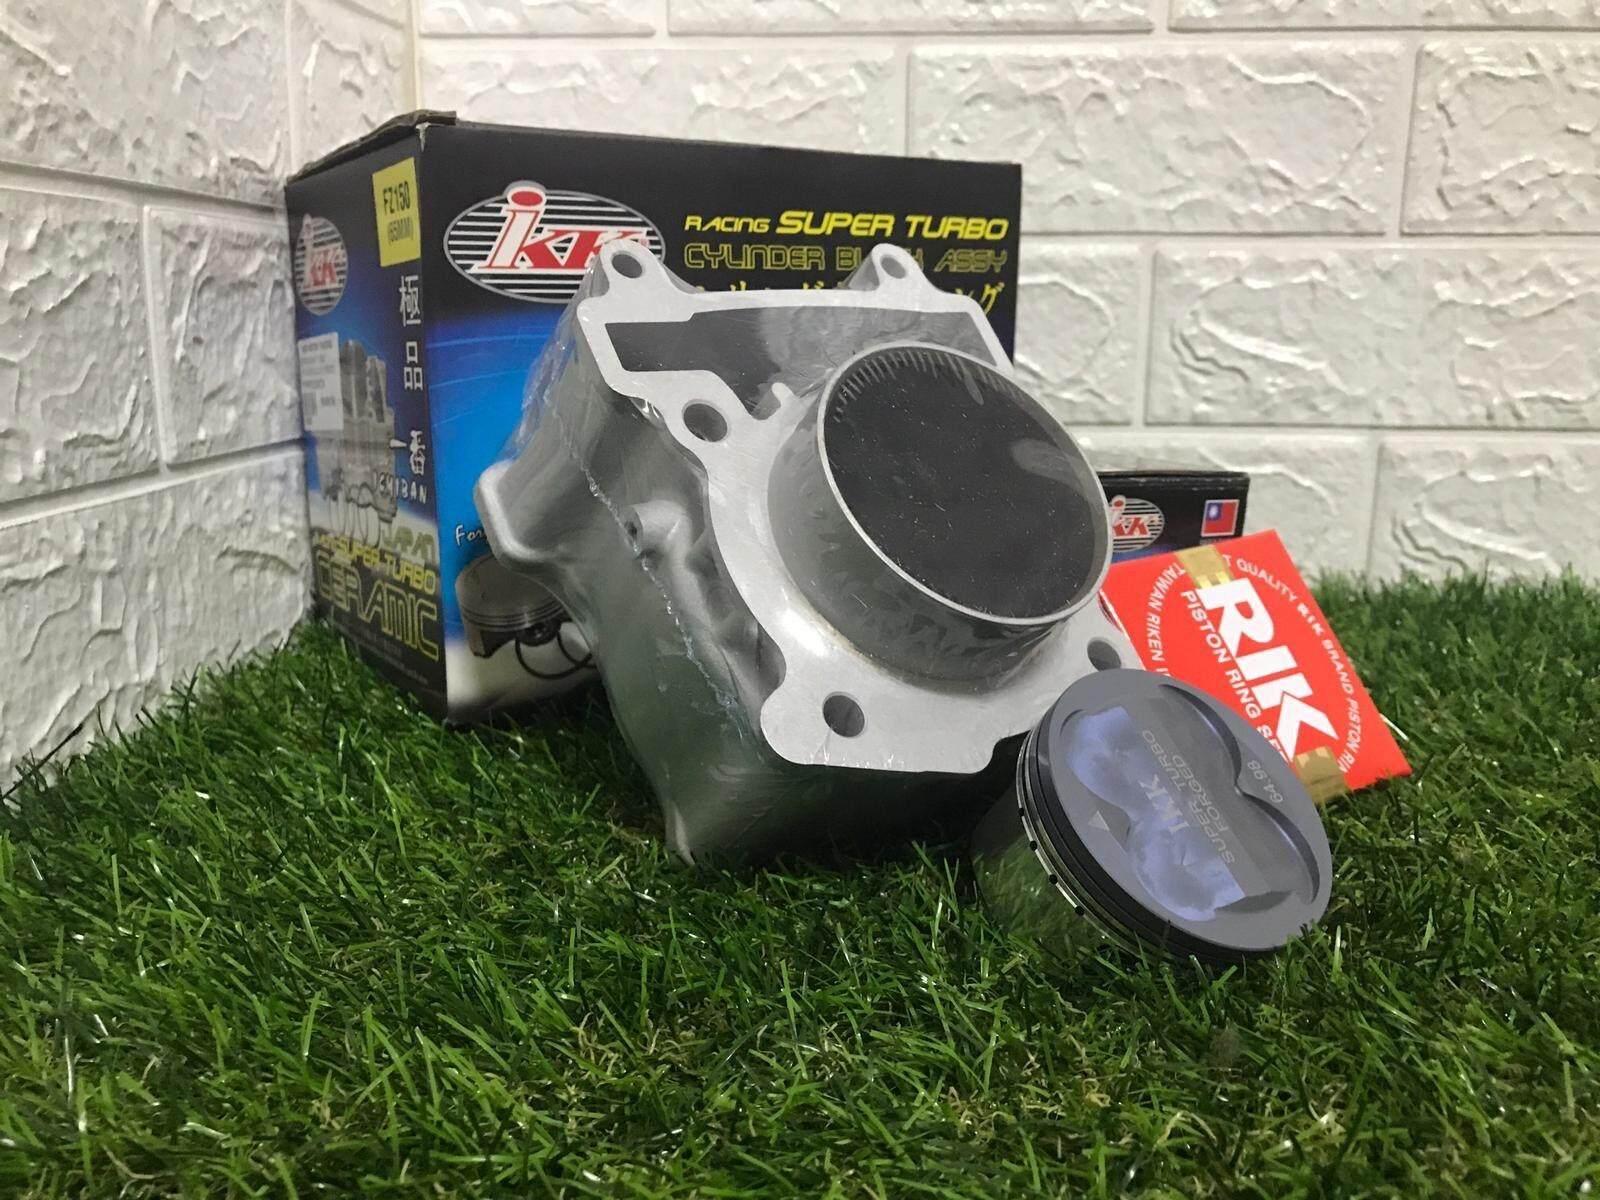 Original IKK racing super turbo block set 65mm FZ150/LC135/Y15ZR